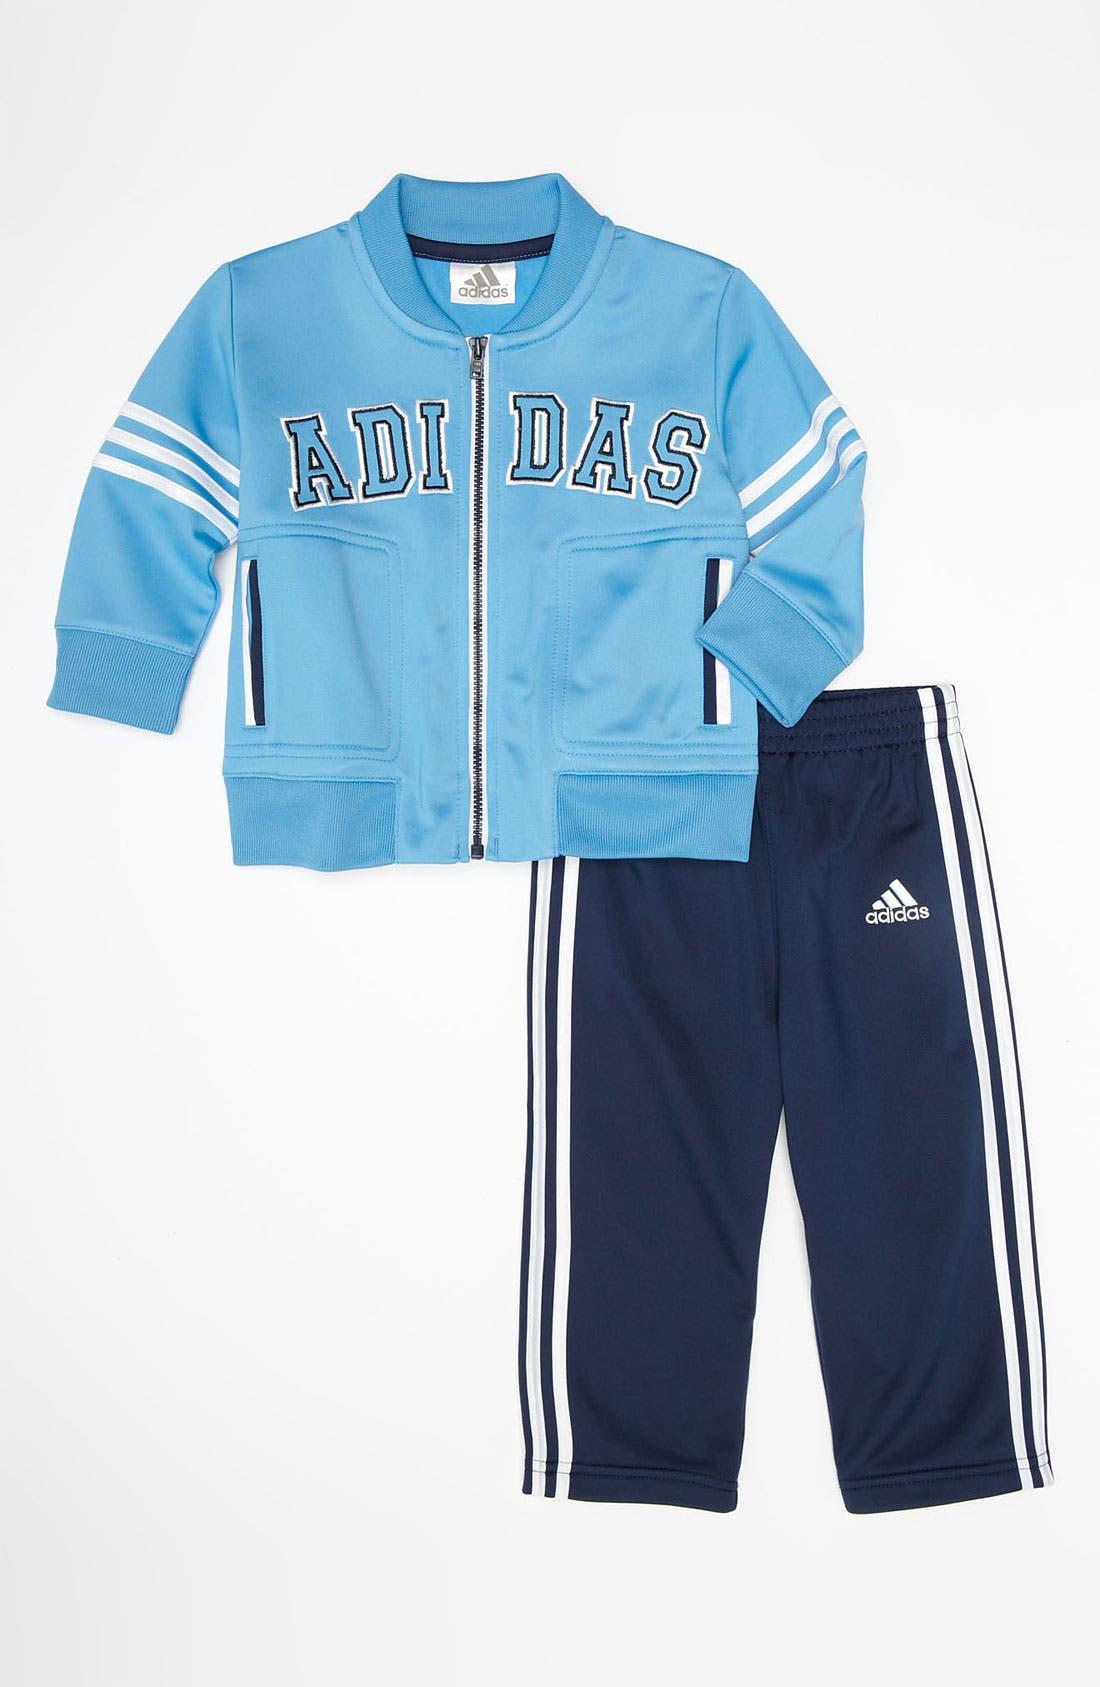 Main Image - adidas 'Team' Jacket & Pants (Infant)